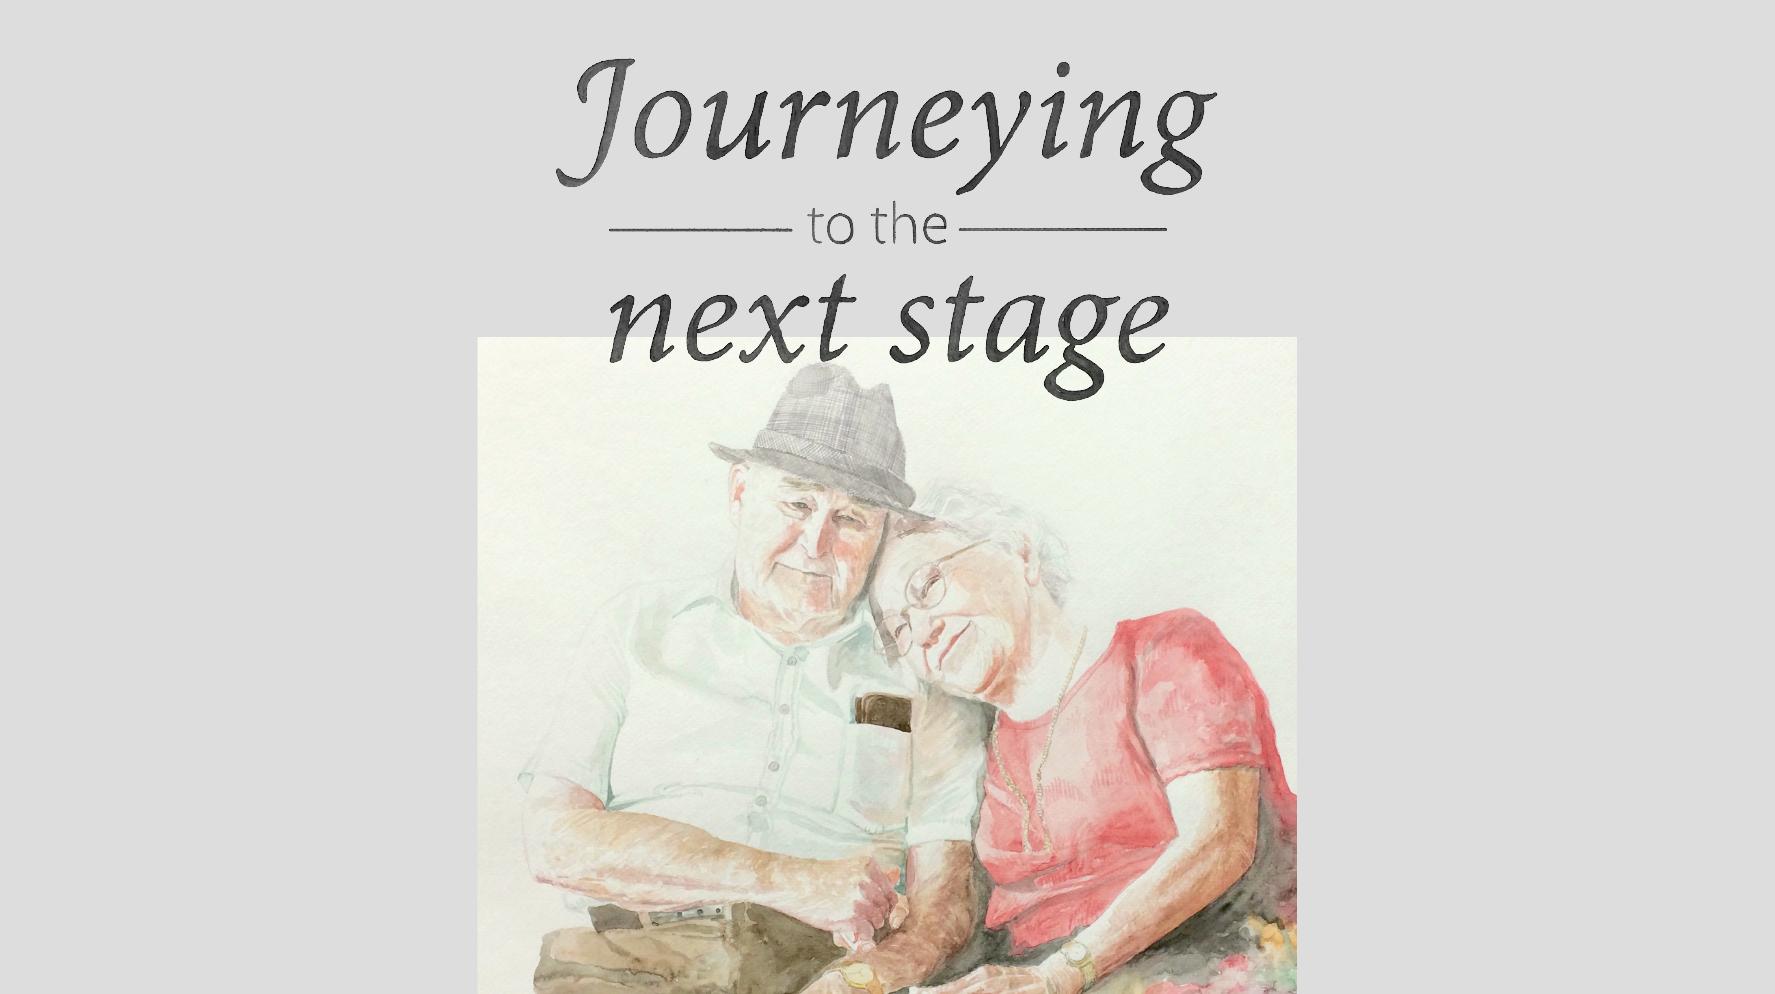 Journeying to the next stage - Mennonite Brethren Herald